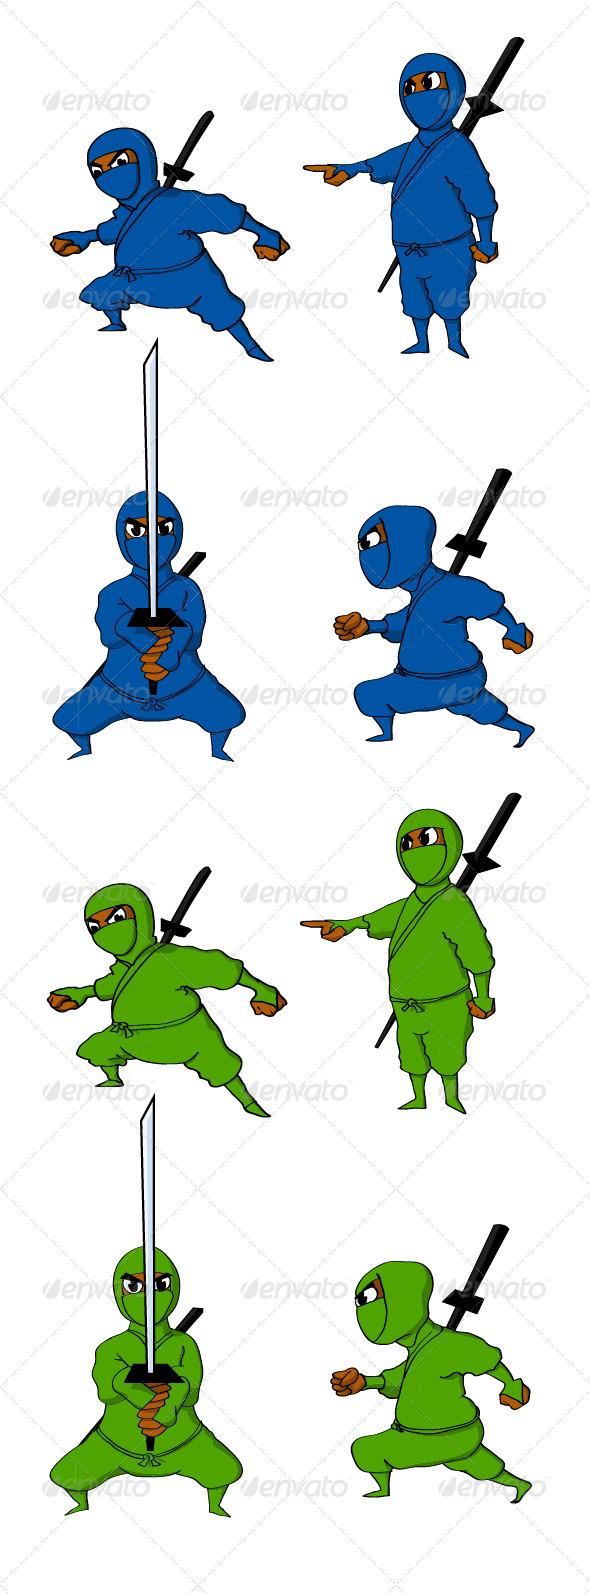 GraphicRiver Ninjas 4096942